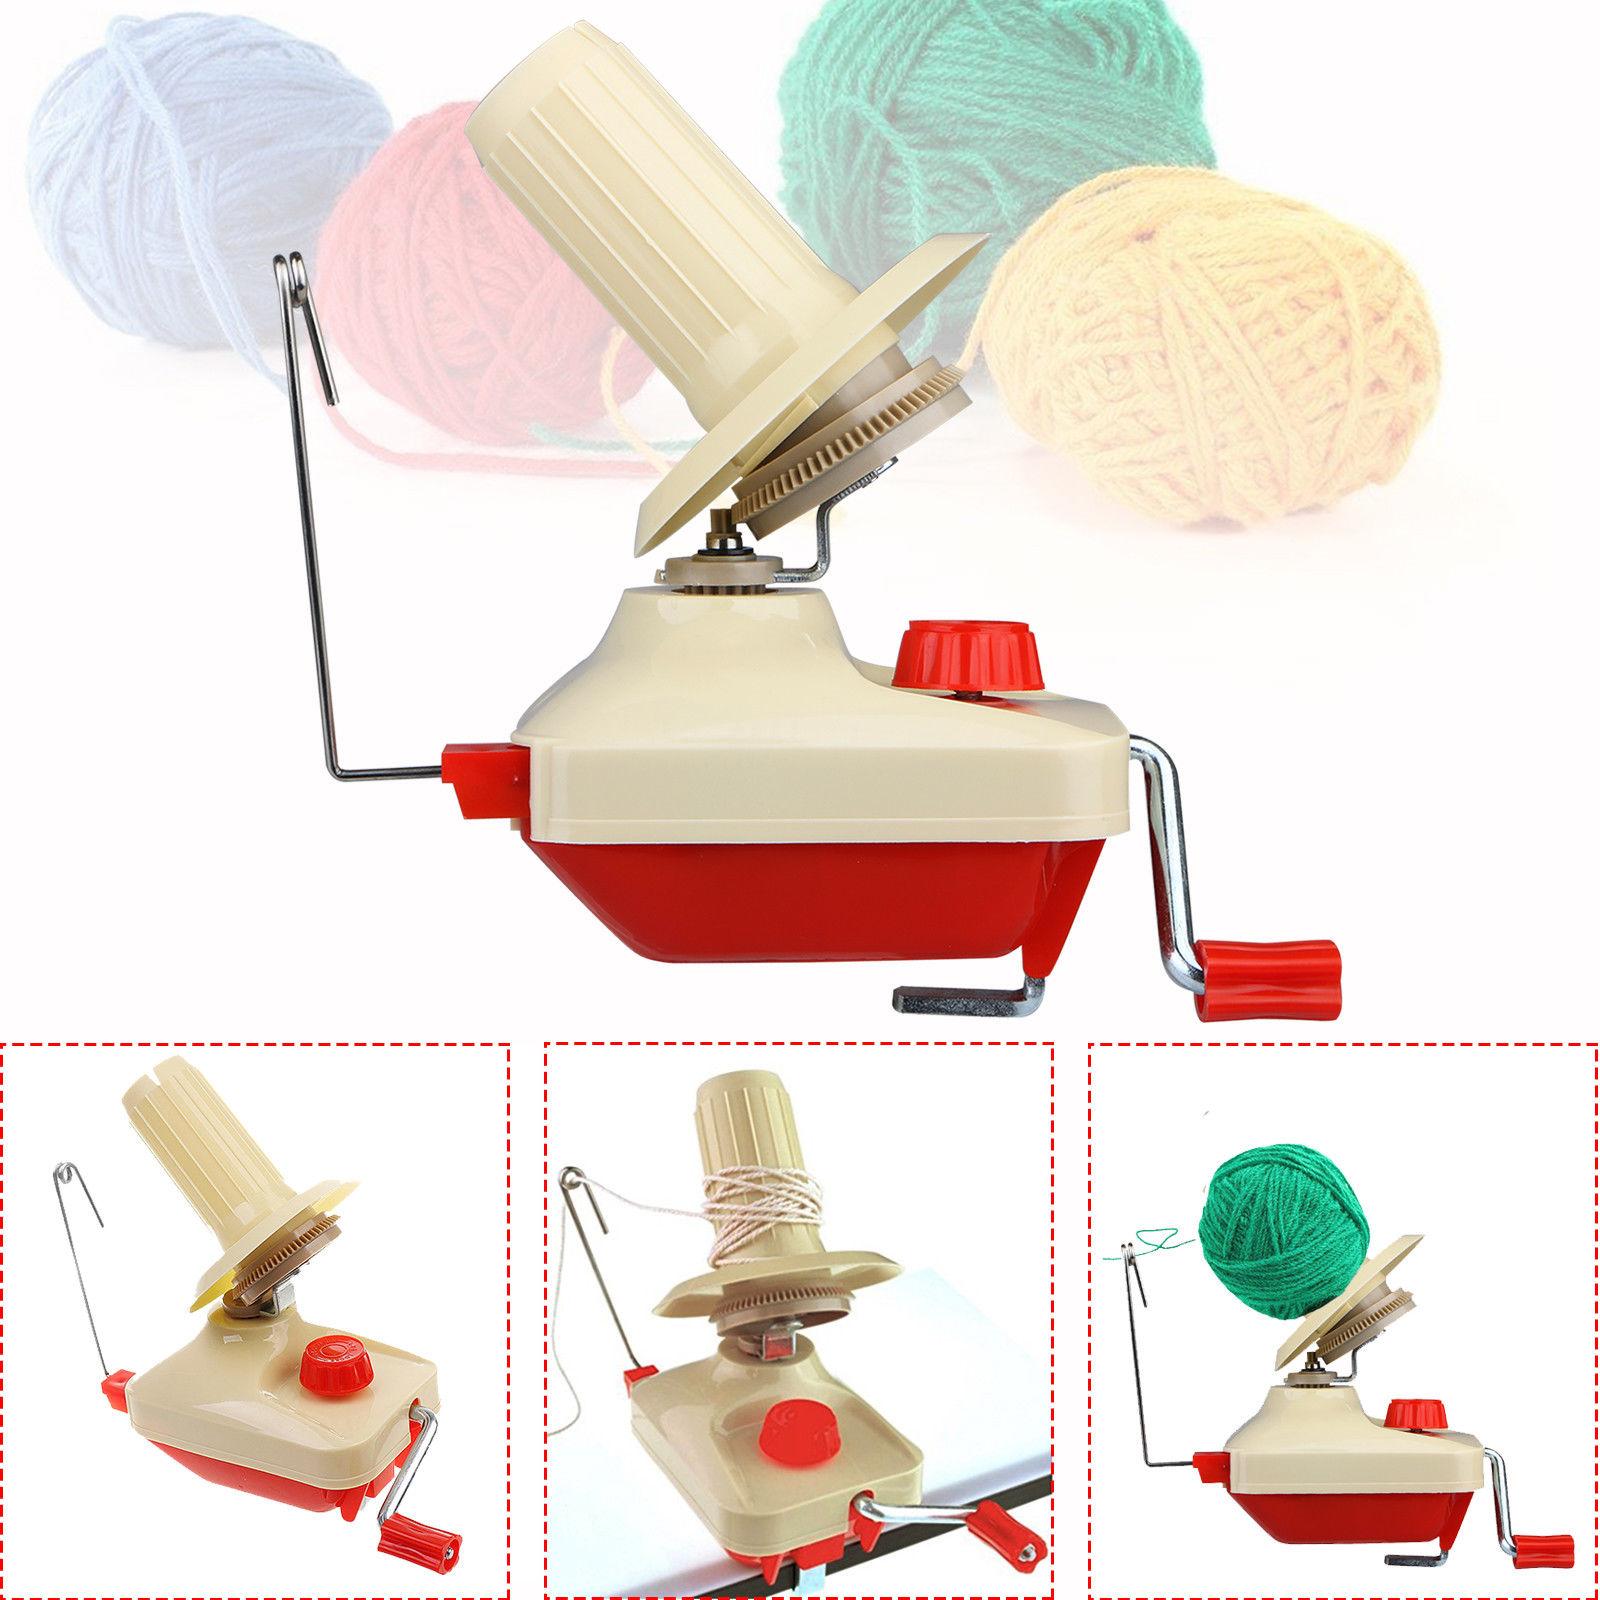 Hand Operated Knitting Roll String Yarn Fiber Wool Thread Ball Winder Holder